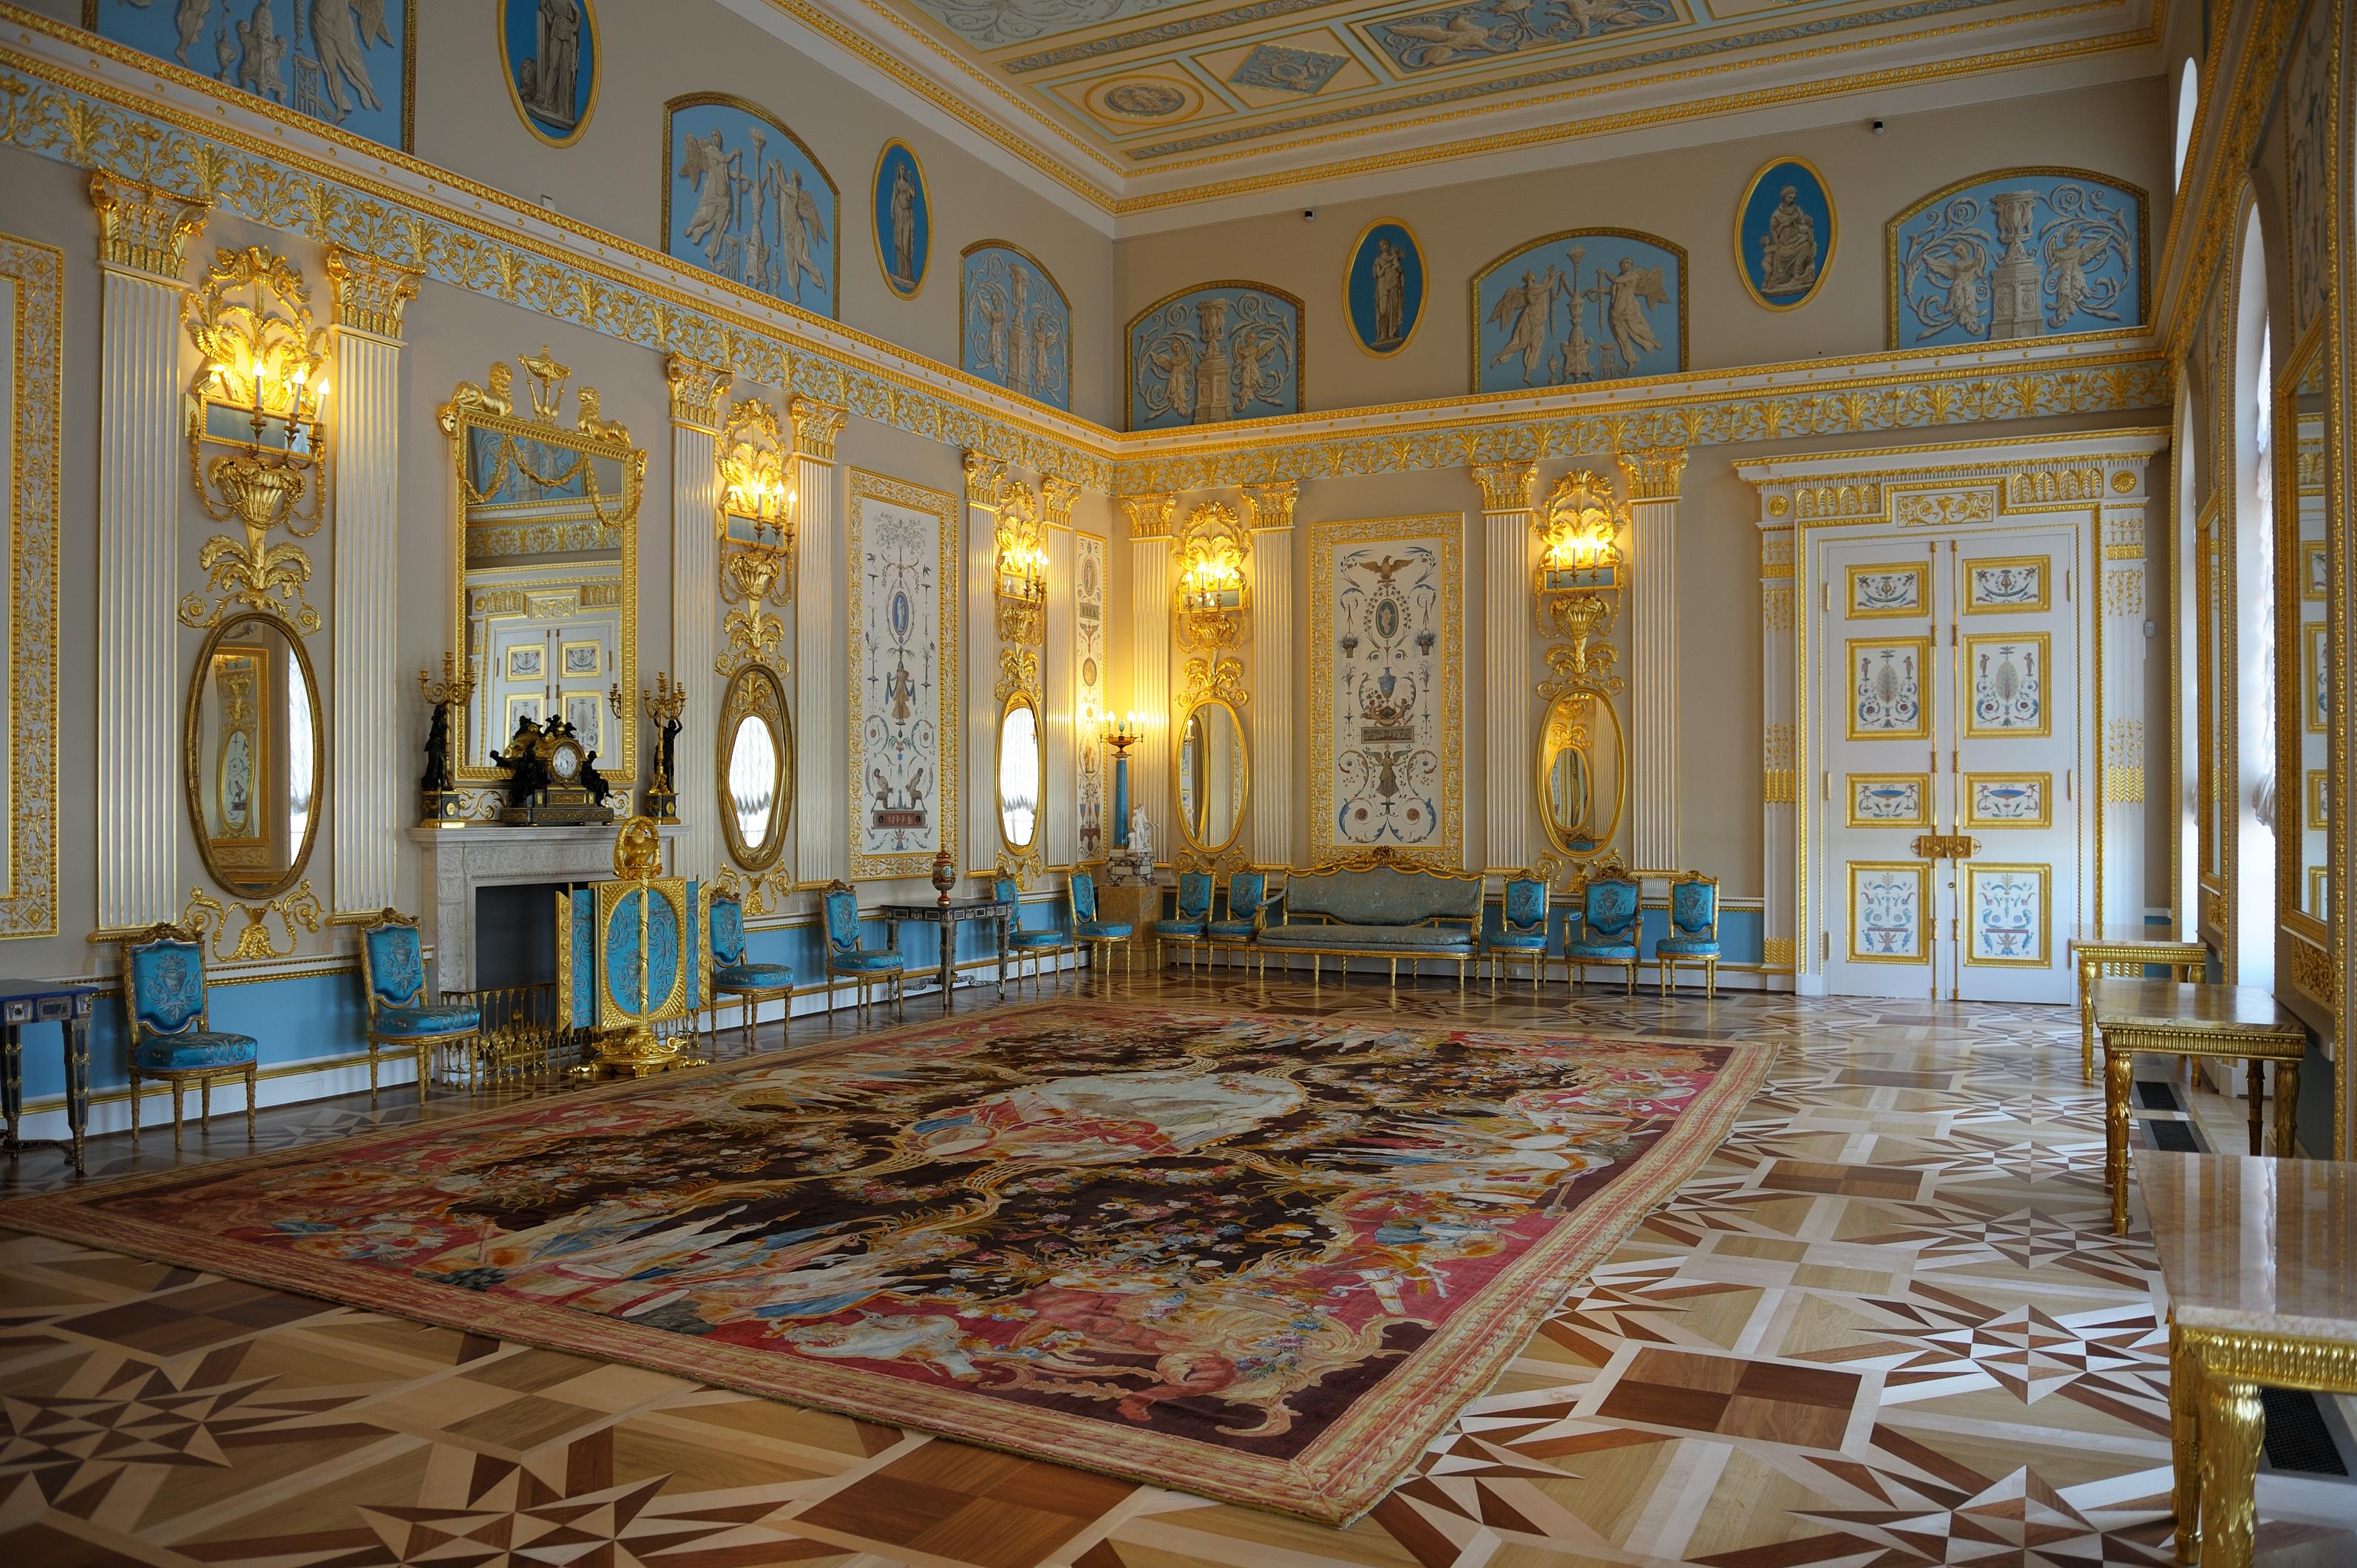 Екатерининский дворец, Арабесковый зал. Автор фото: Aleks G (Wikimedia Commons)